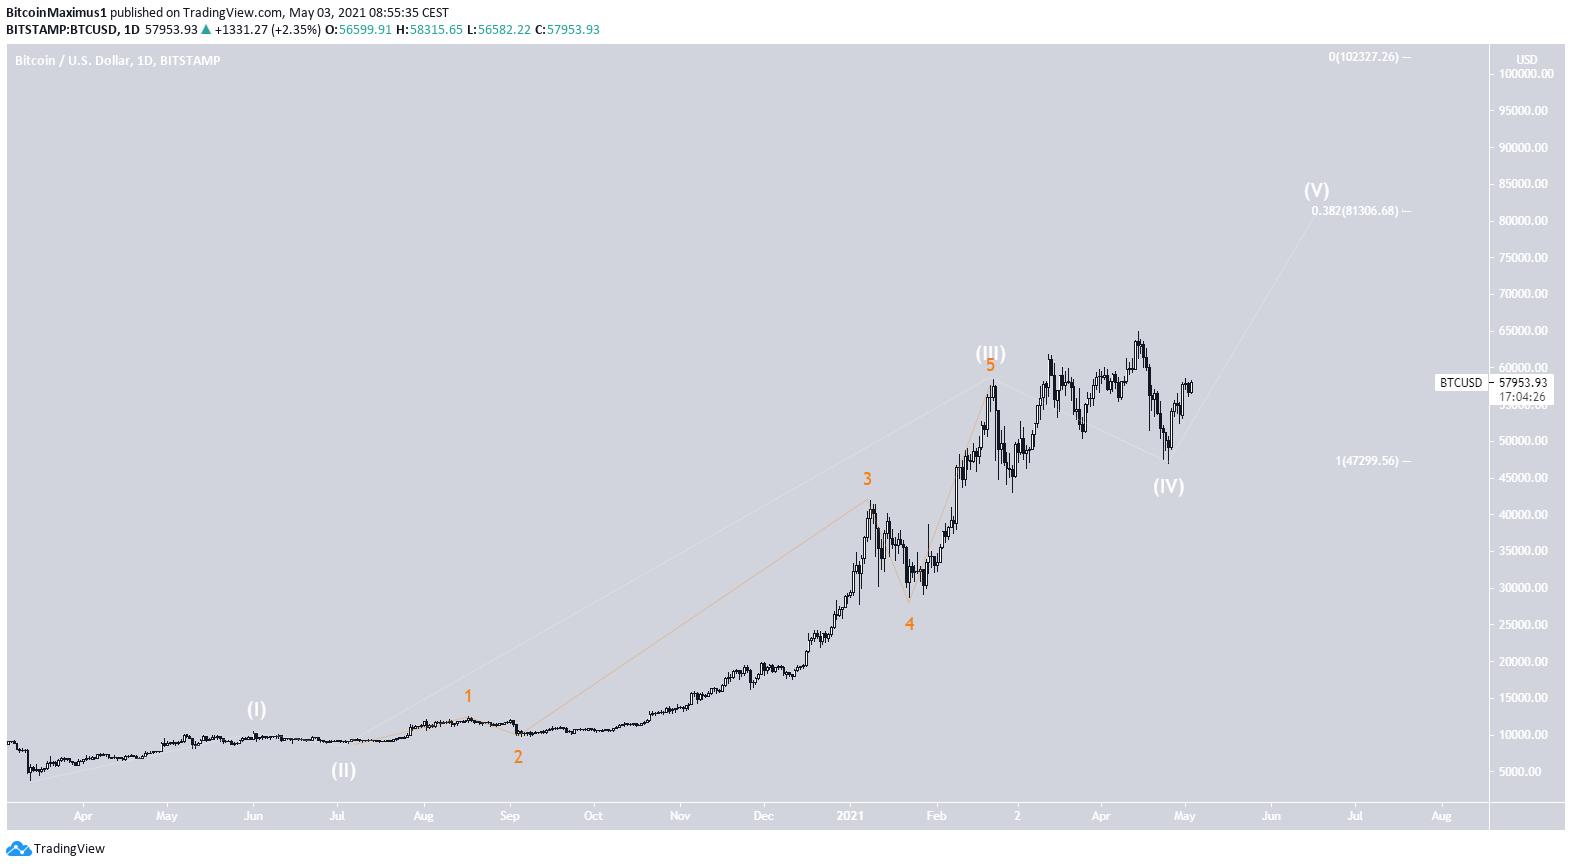 Bitcoin Kurs Wellenanalyse Chart Preis 1 30.05.2021